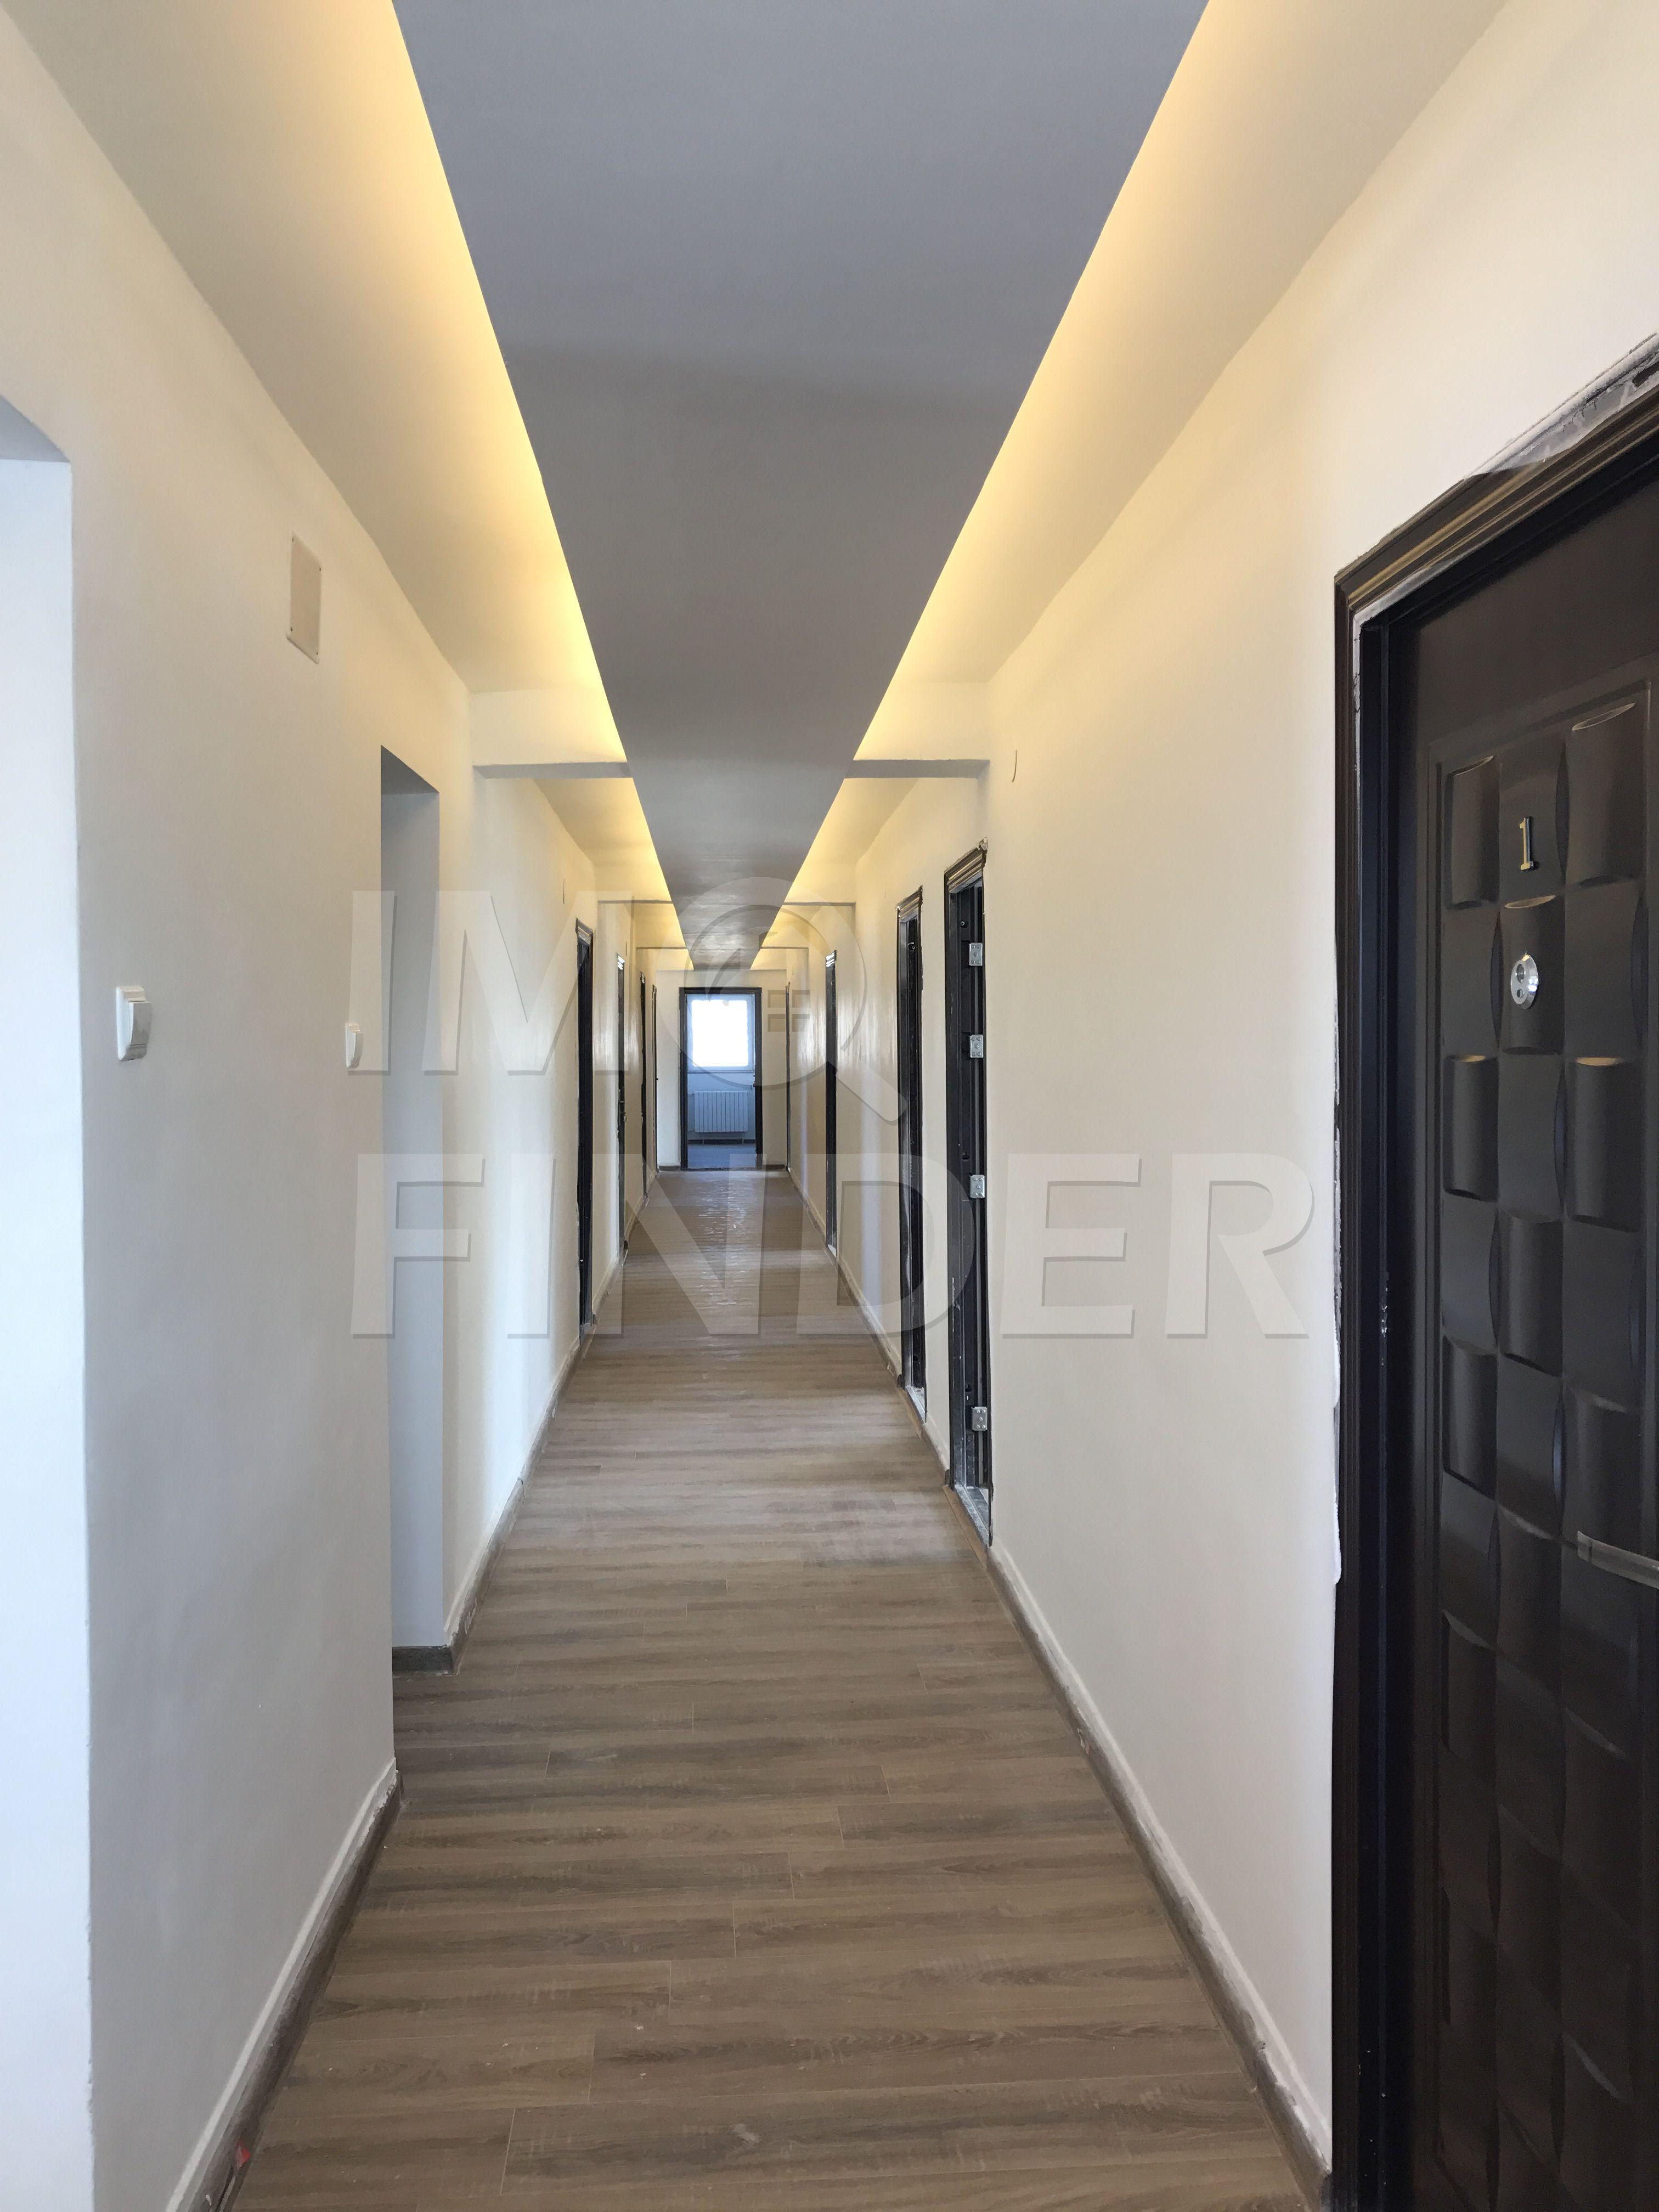 Inchiriere birouri, strada Plevnei, intre 18 -45 mp